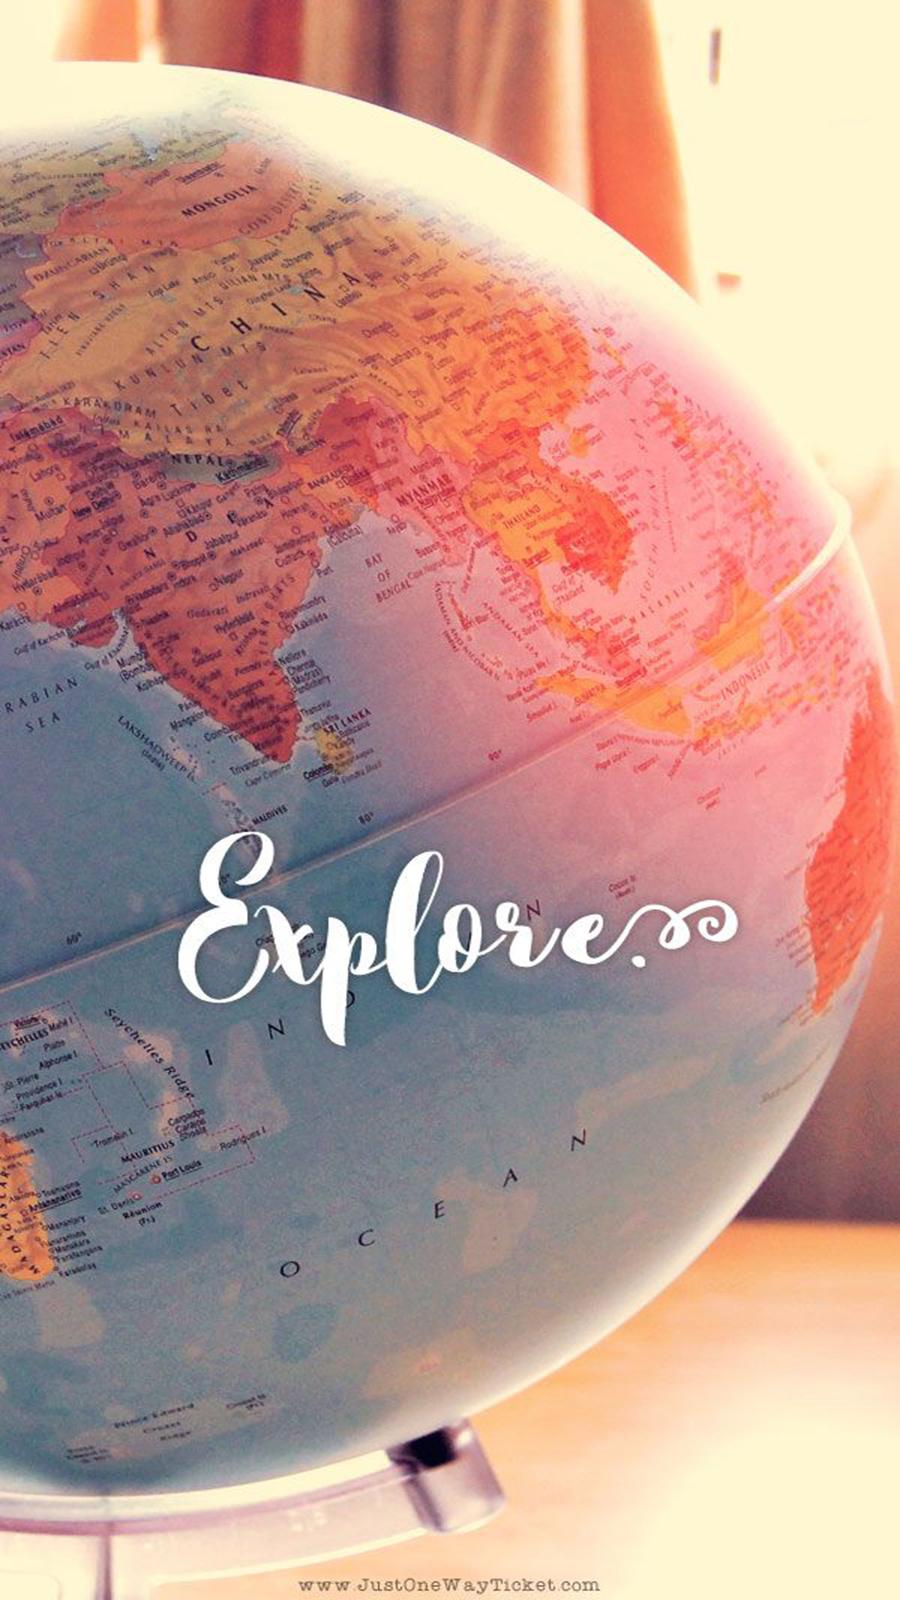 90+ Travel Phone HD Wallpapers Free Download-Bestwallpapers (14)